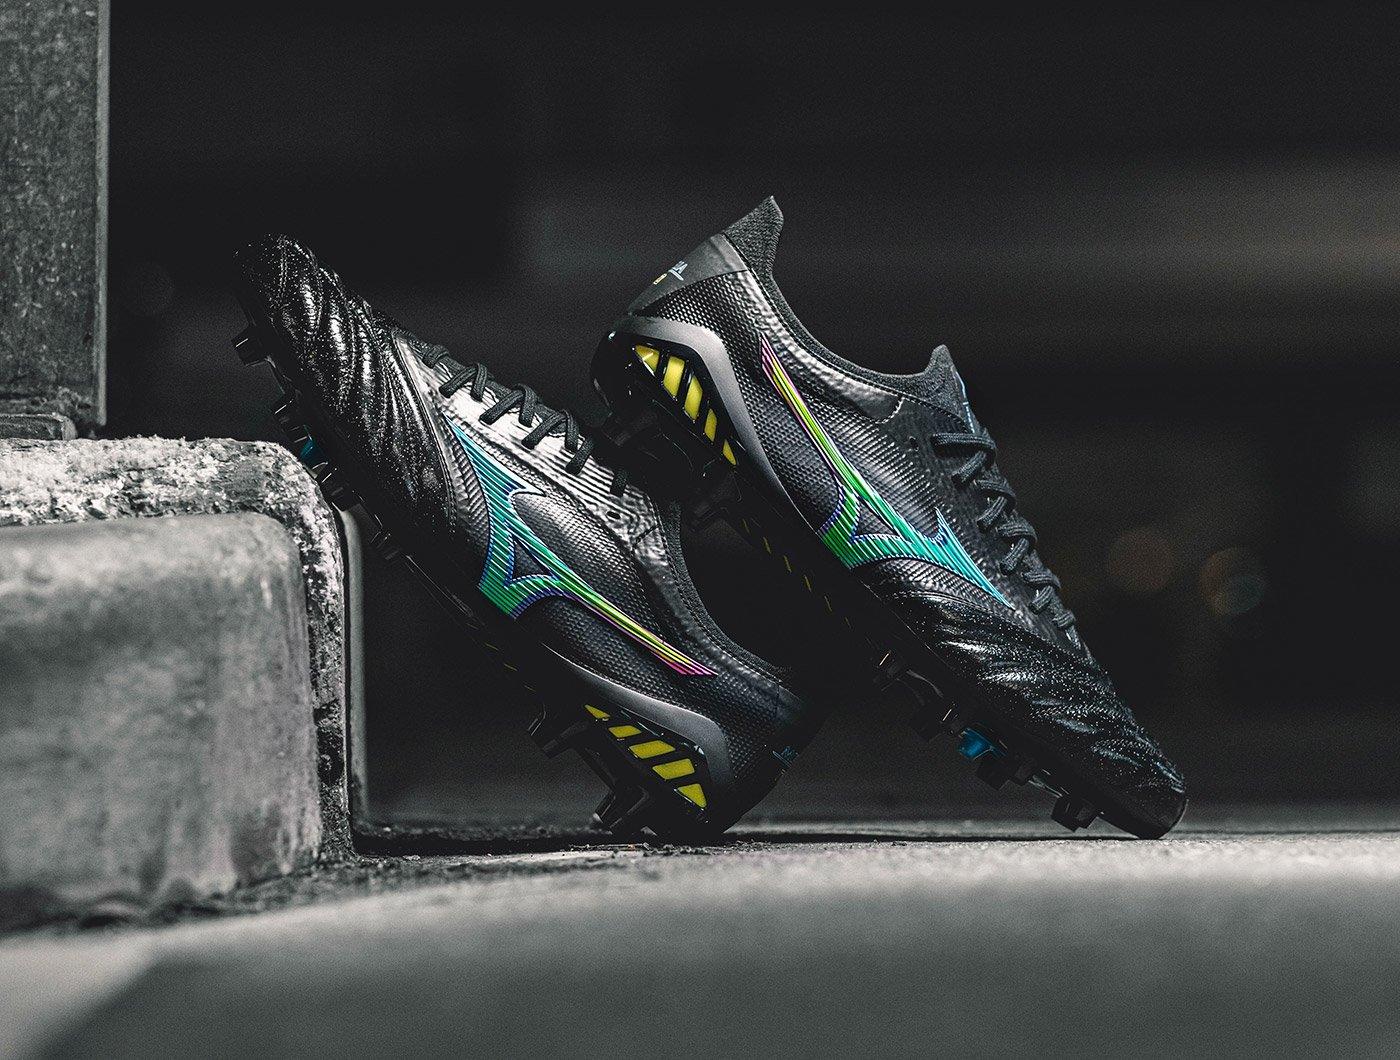 reputable site 2c20d 4c742 Football Boots - Nike, adidas   New Balance Football Boots - Lovell ...